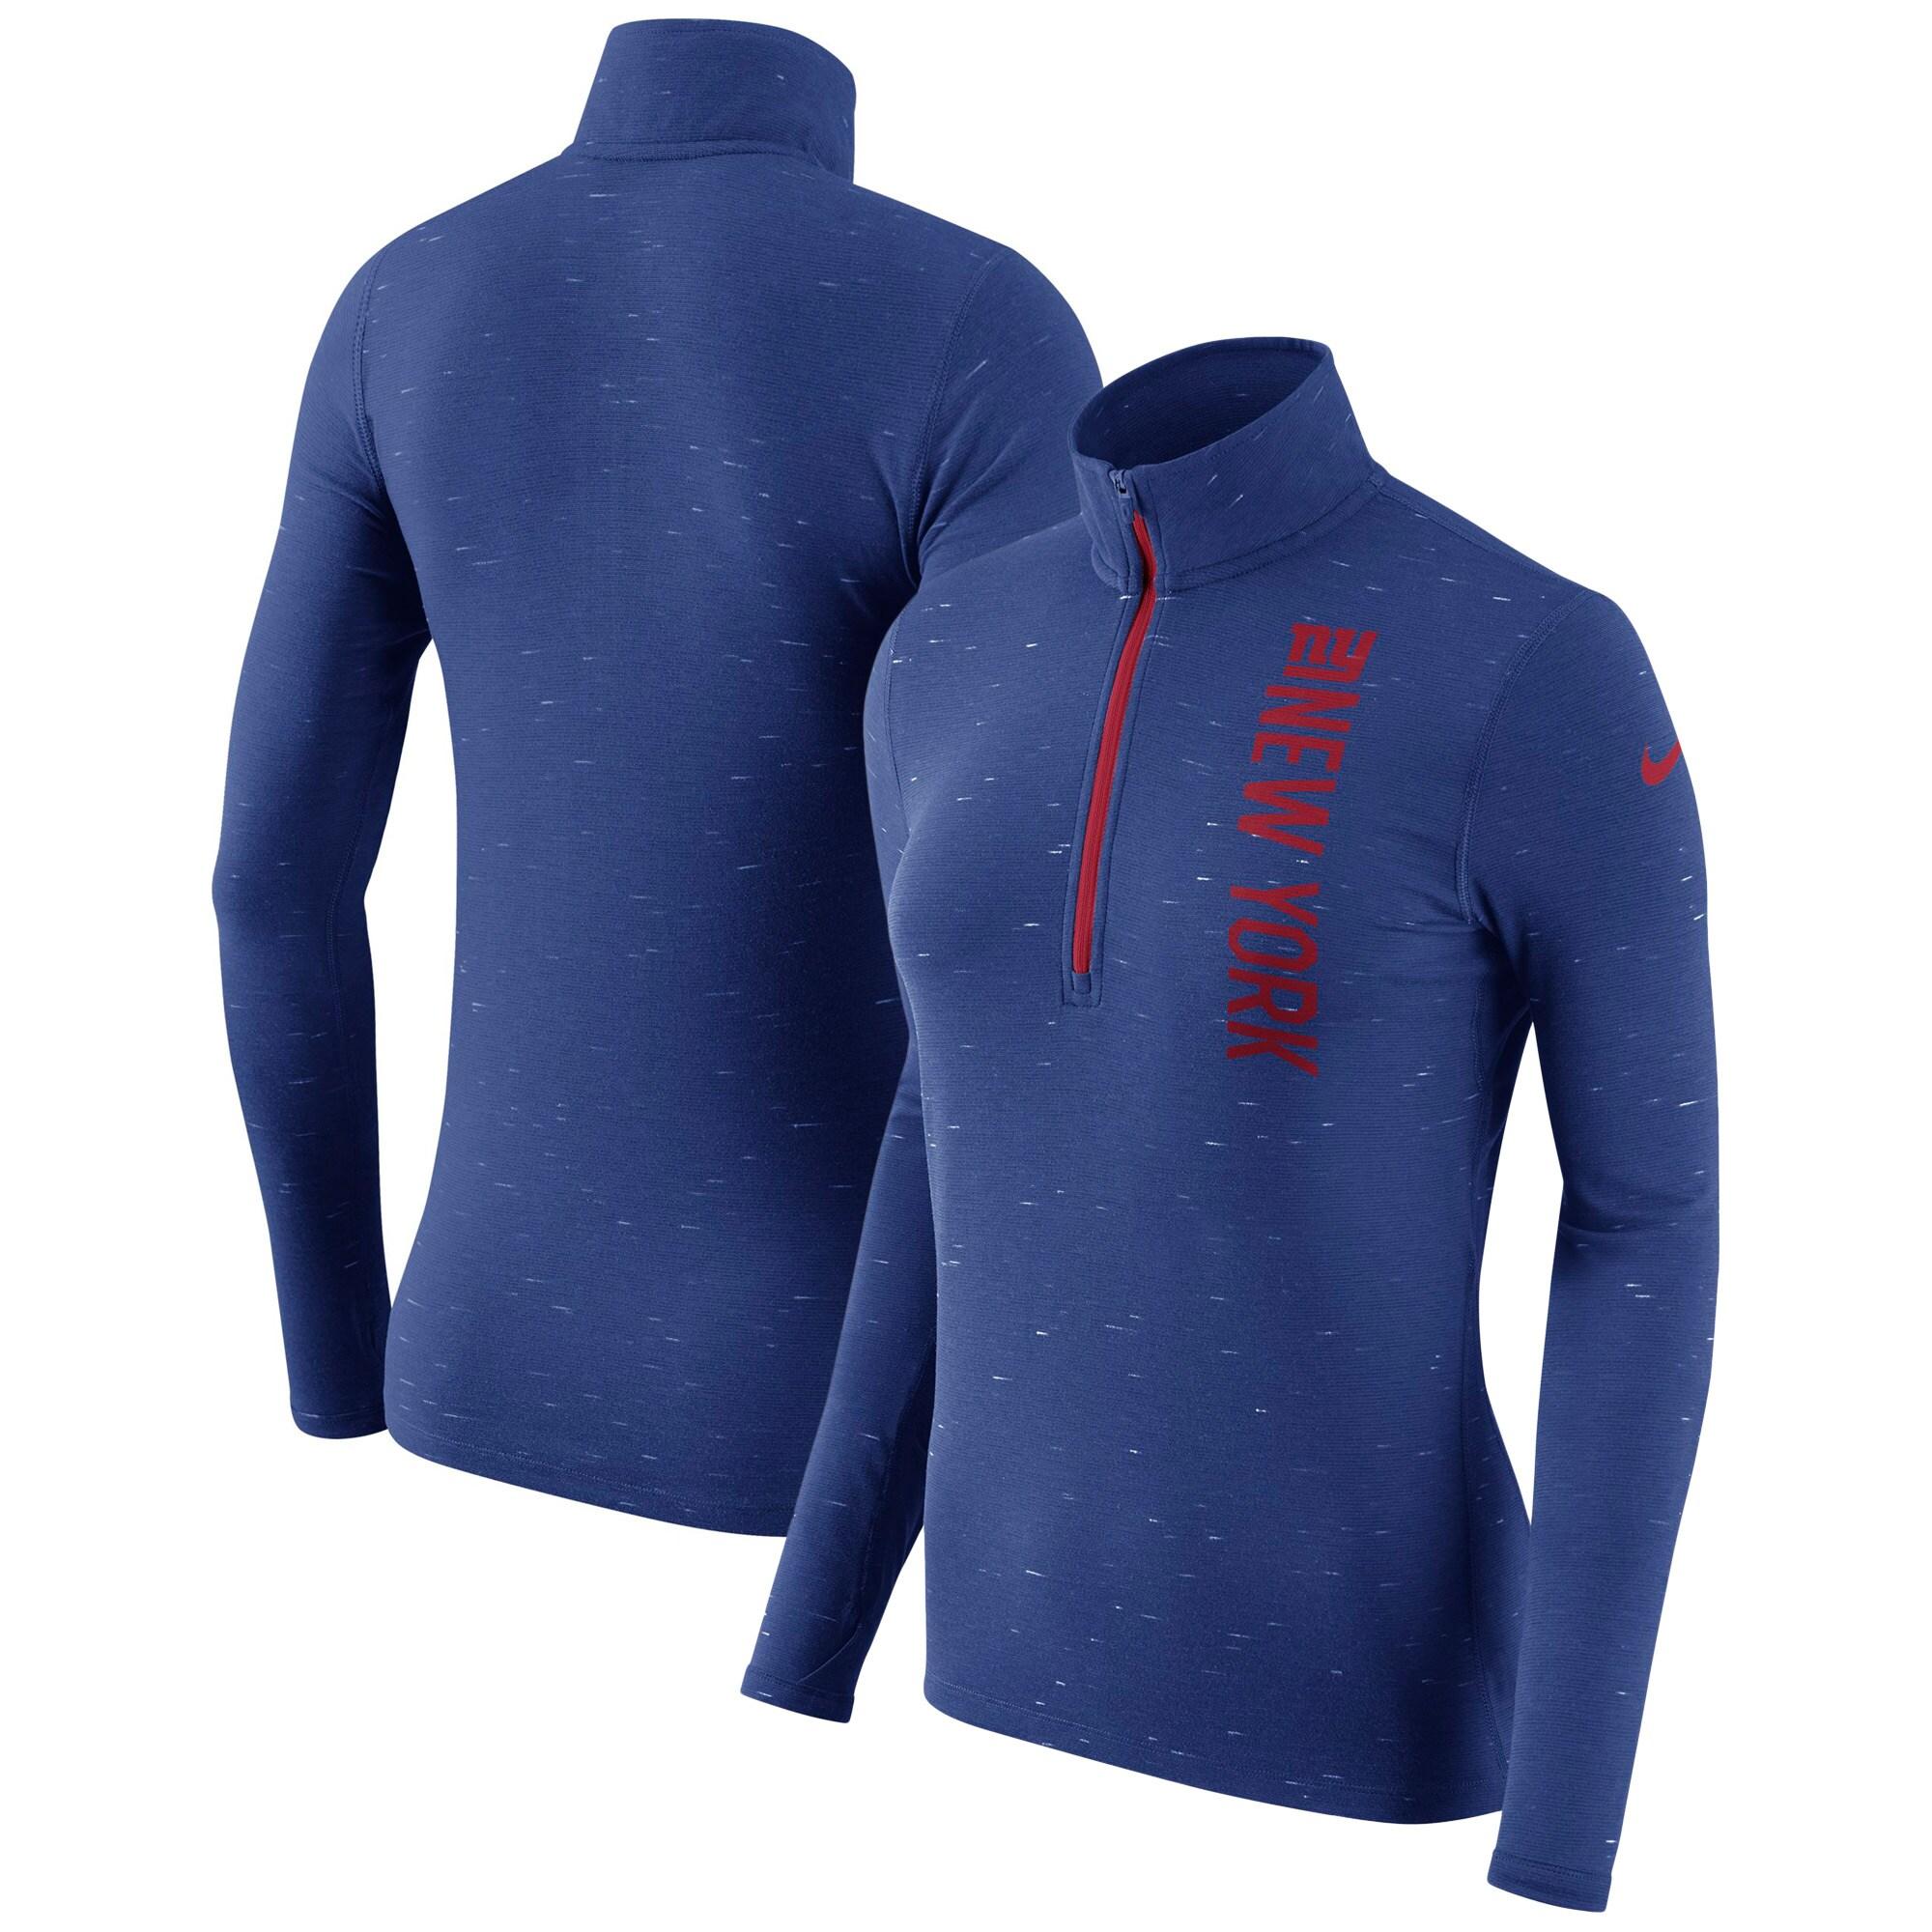 New York Giants Nike Women's Element Half-Zip Wordmark Performance Jacket - Heathered Royal